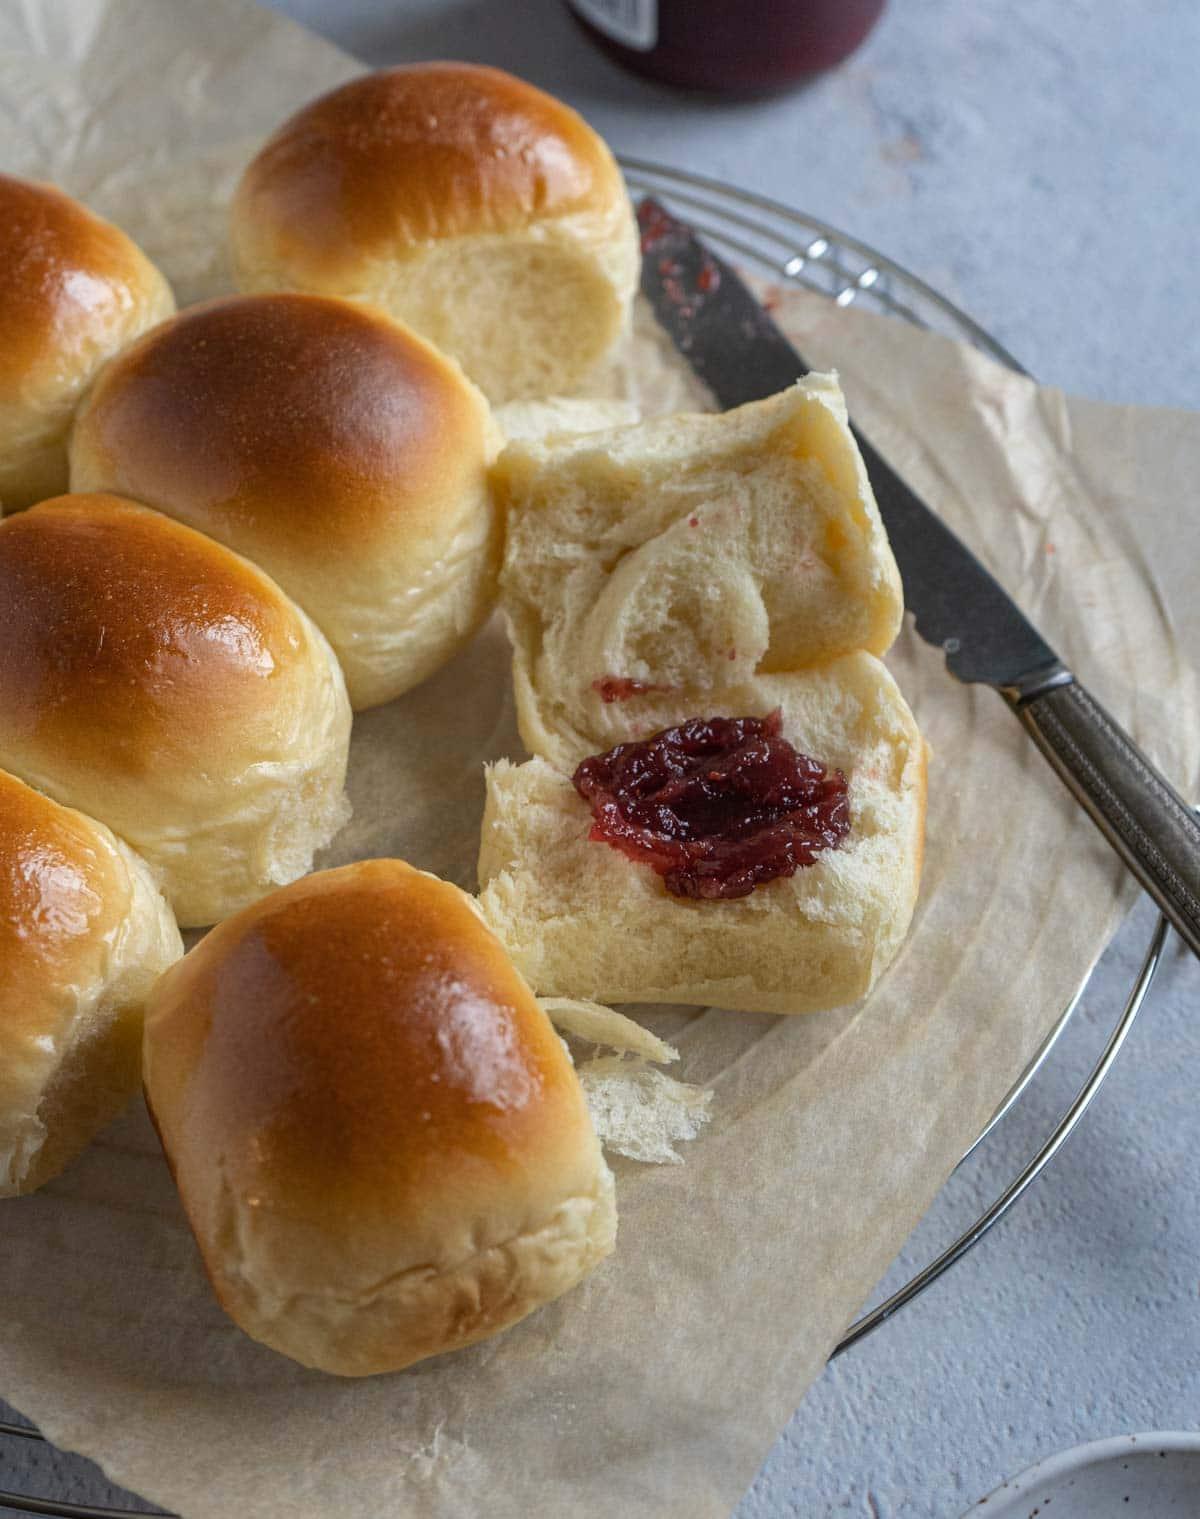 milk bread spread with jam.